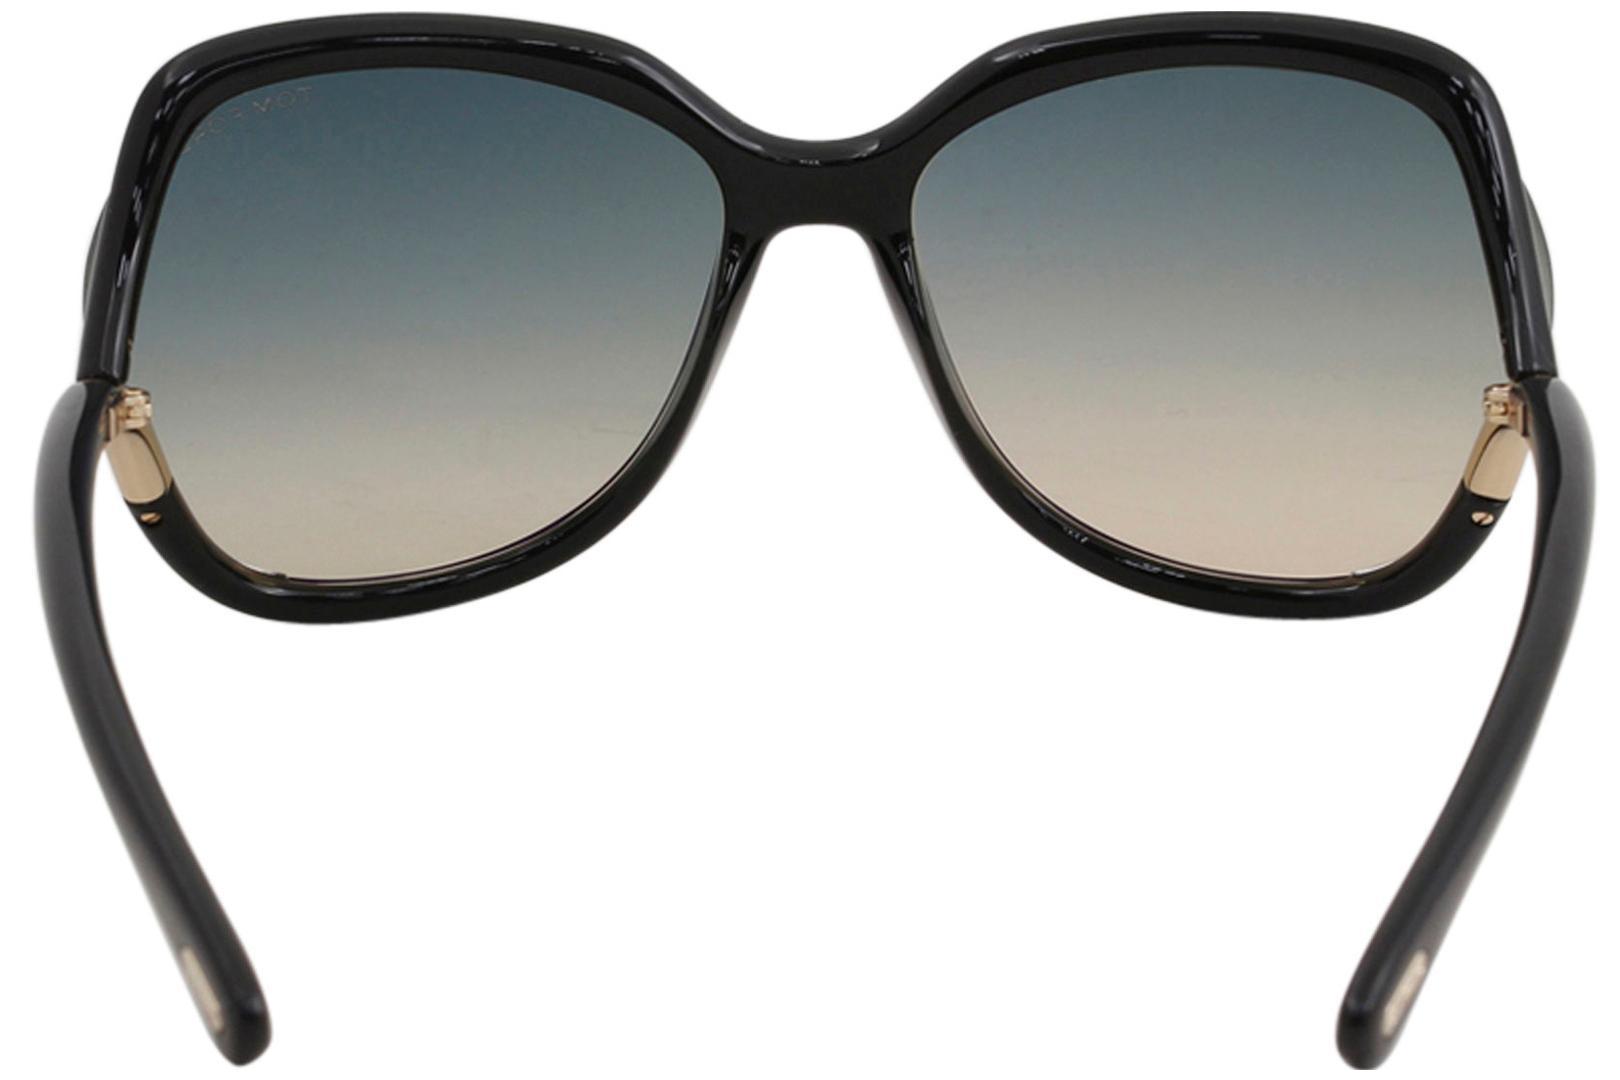 fa9028f409f14 Tom Ford Women s Anouk-02 TF578 TF 578 Fashion Butterfly Sunglasses